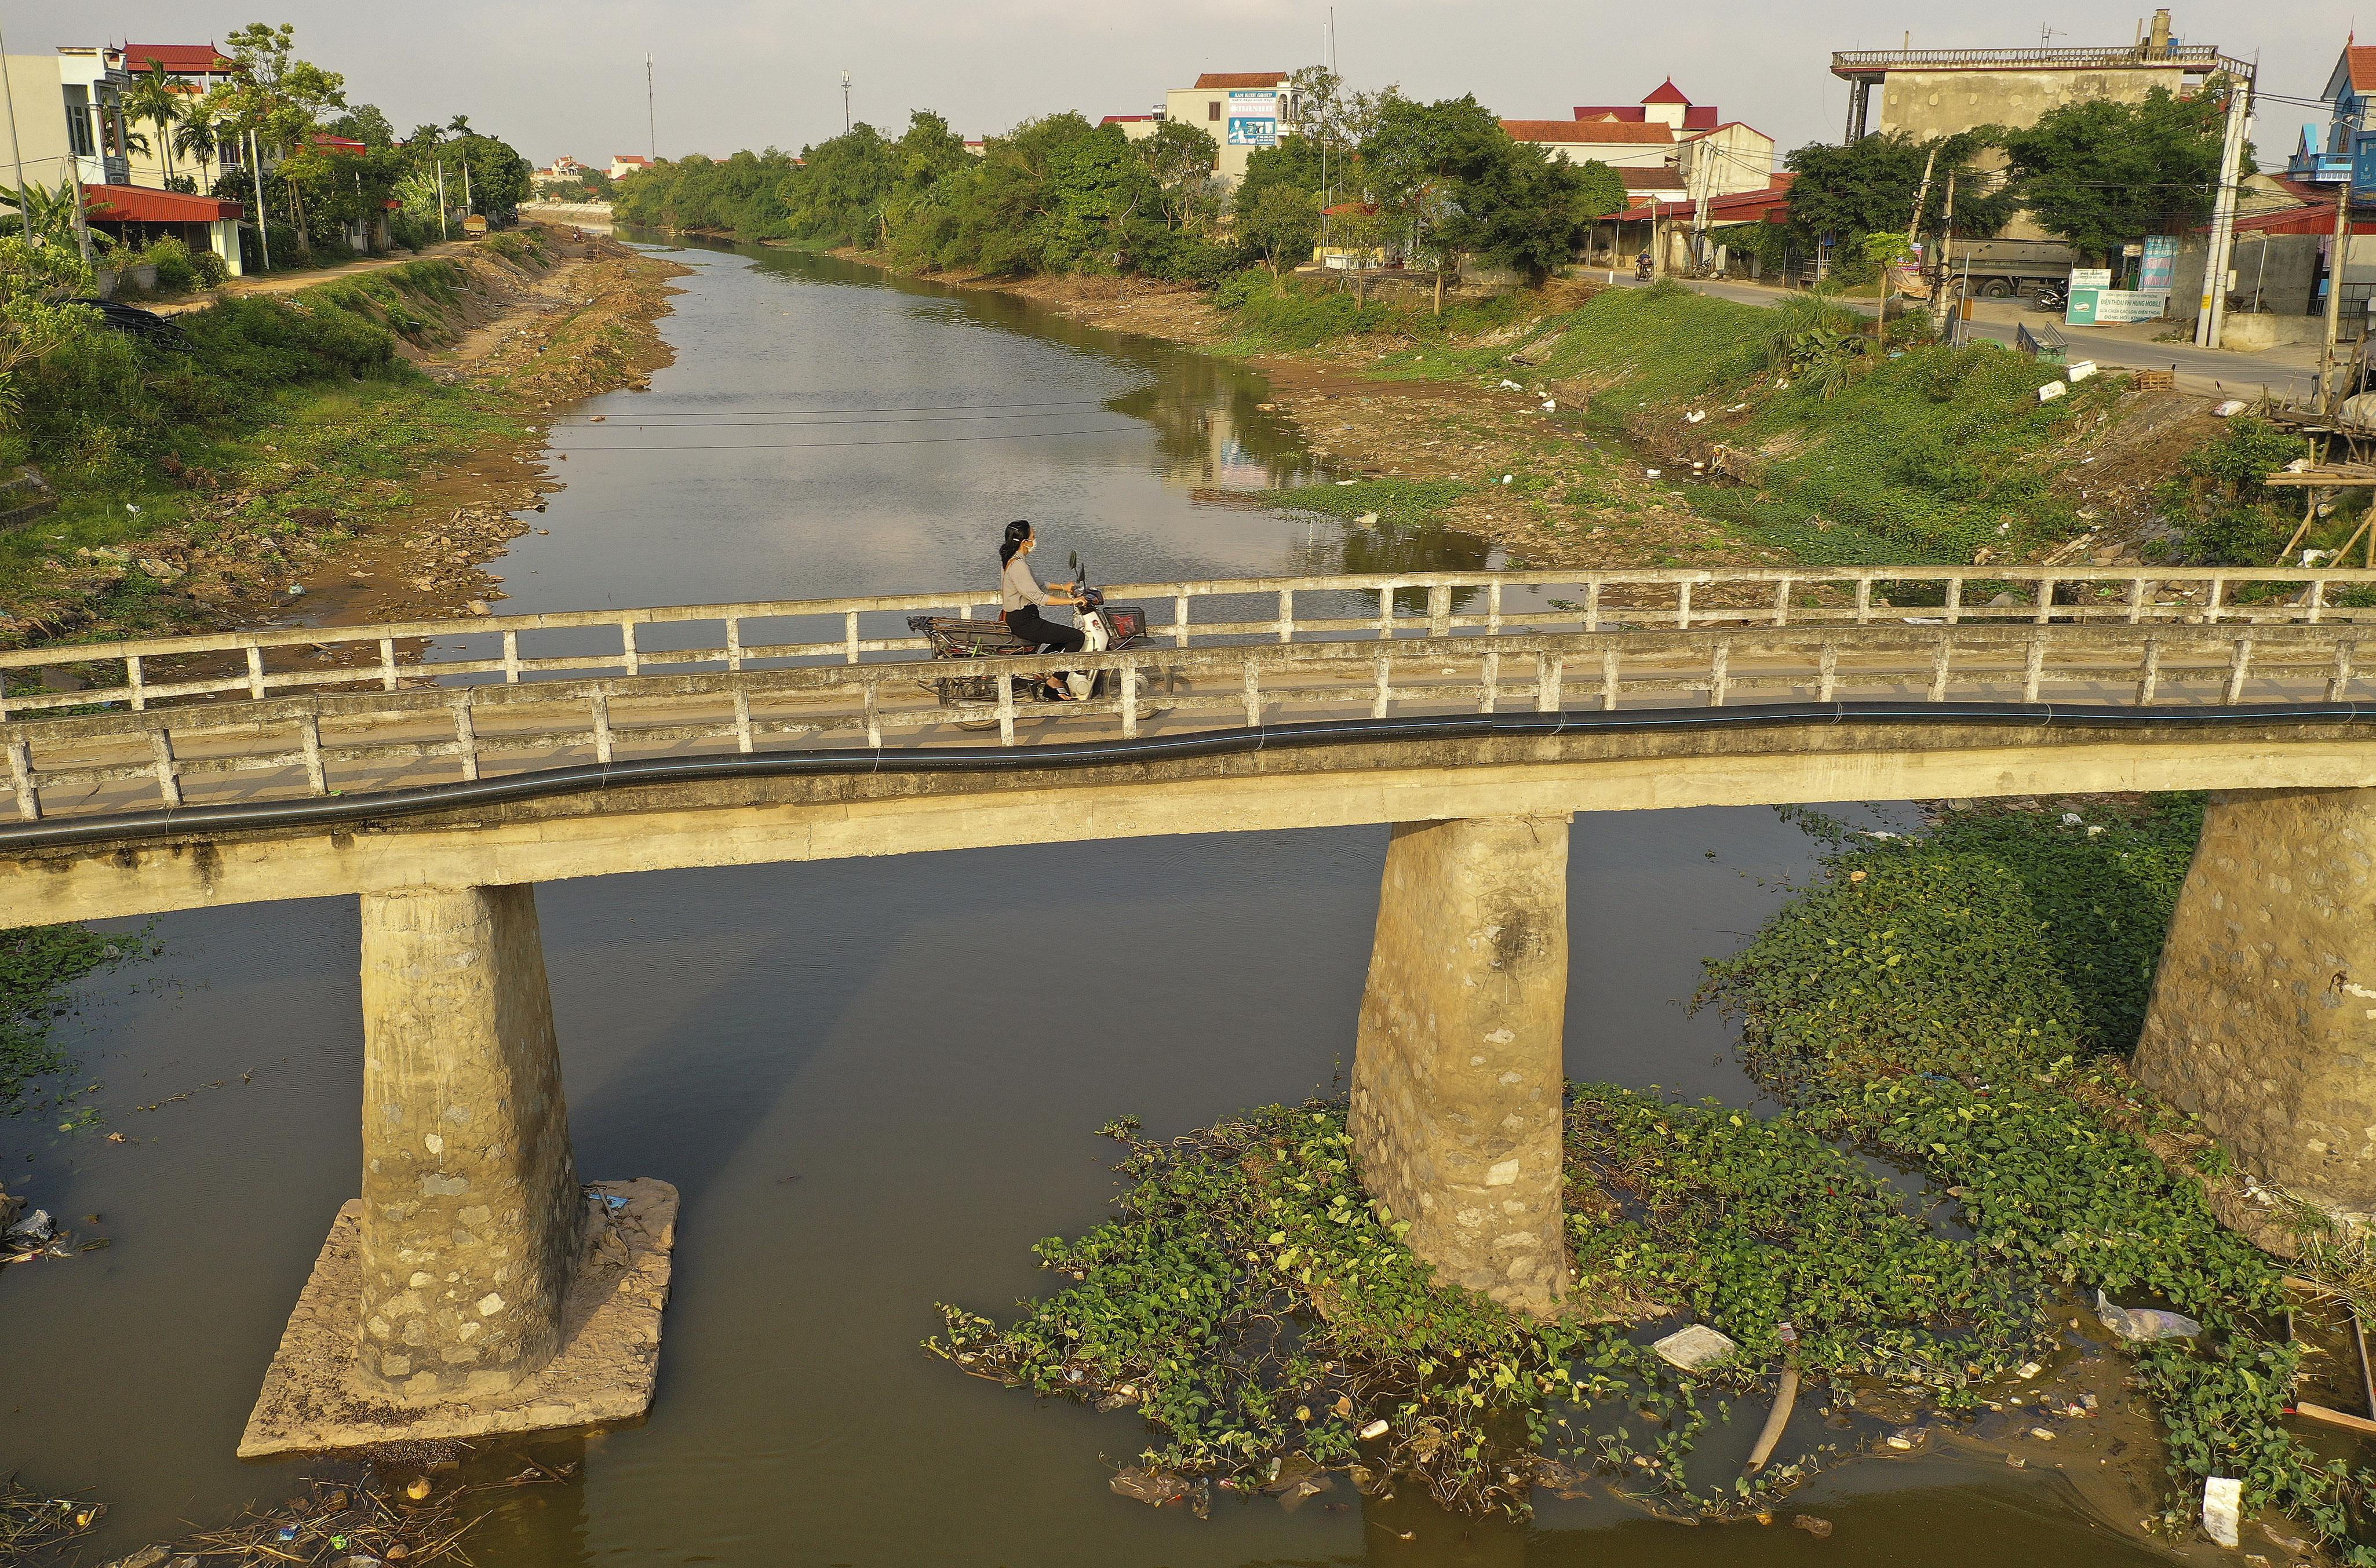 A motorist travels across a bridge in Hanoi, Vietnam on Saturday, Nov. 16, 2019.